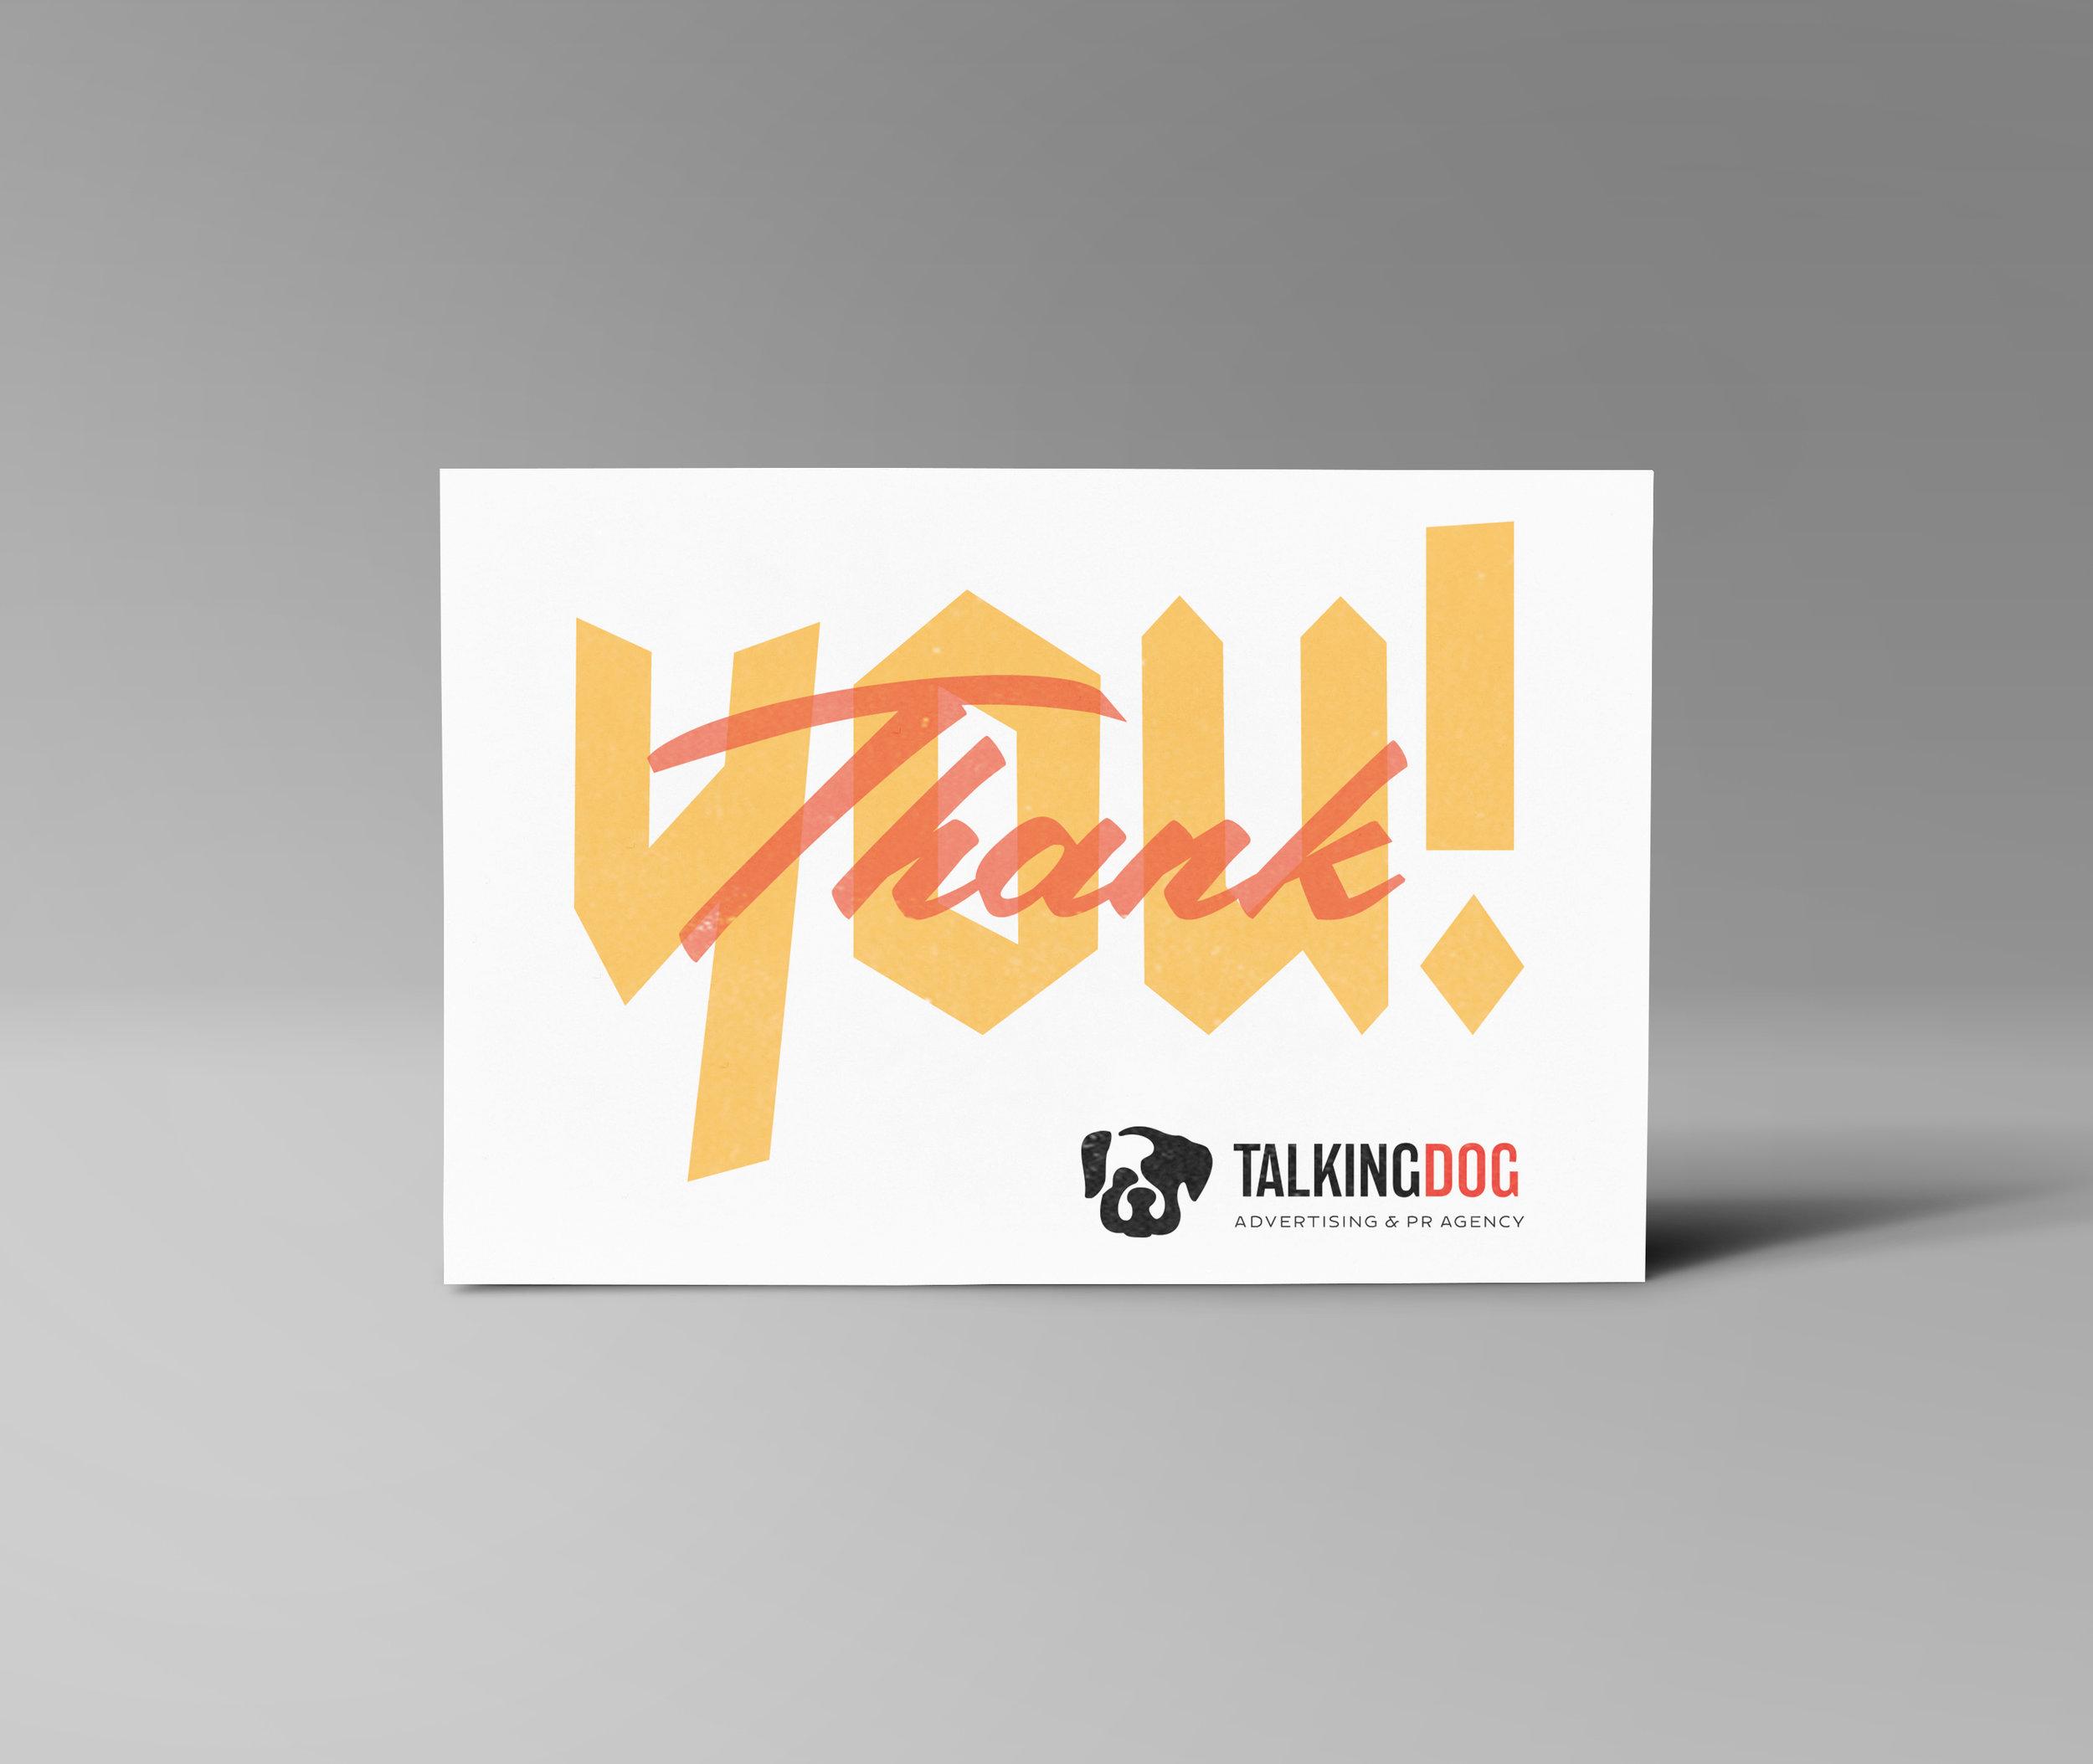 Card-Mockup-PSD.jpg